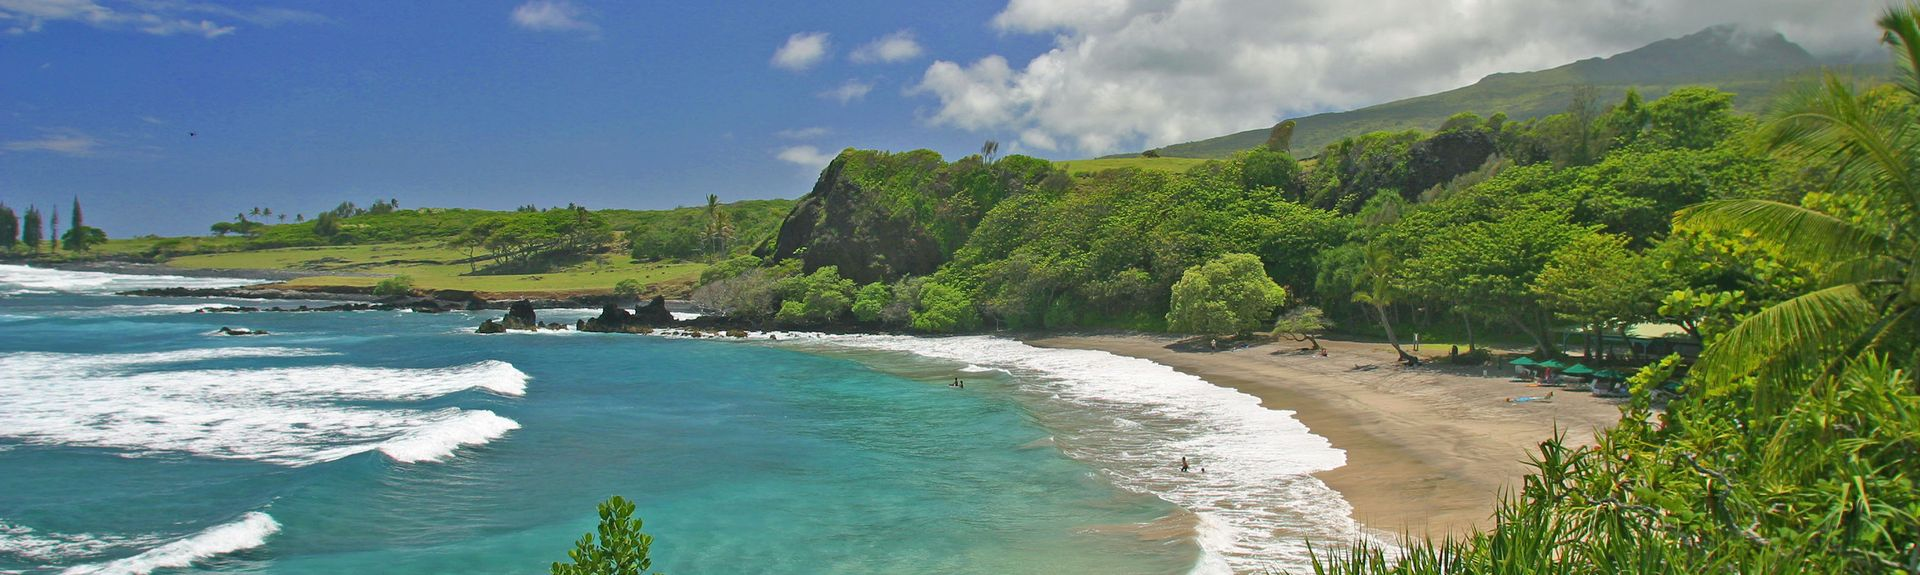 East Maui, Hawaii, Stati Uniti d'America